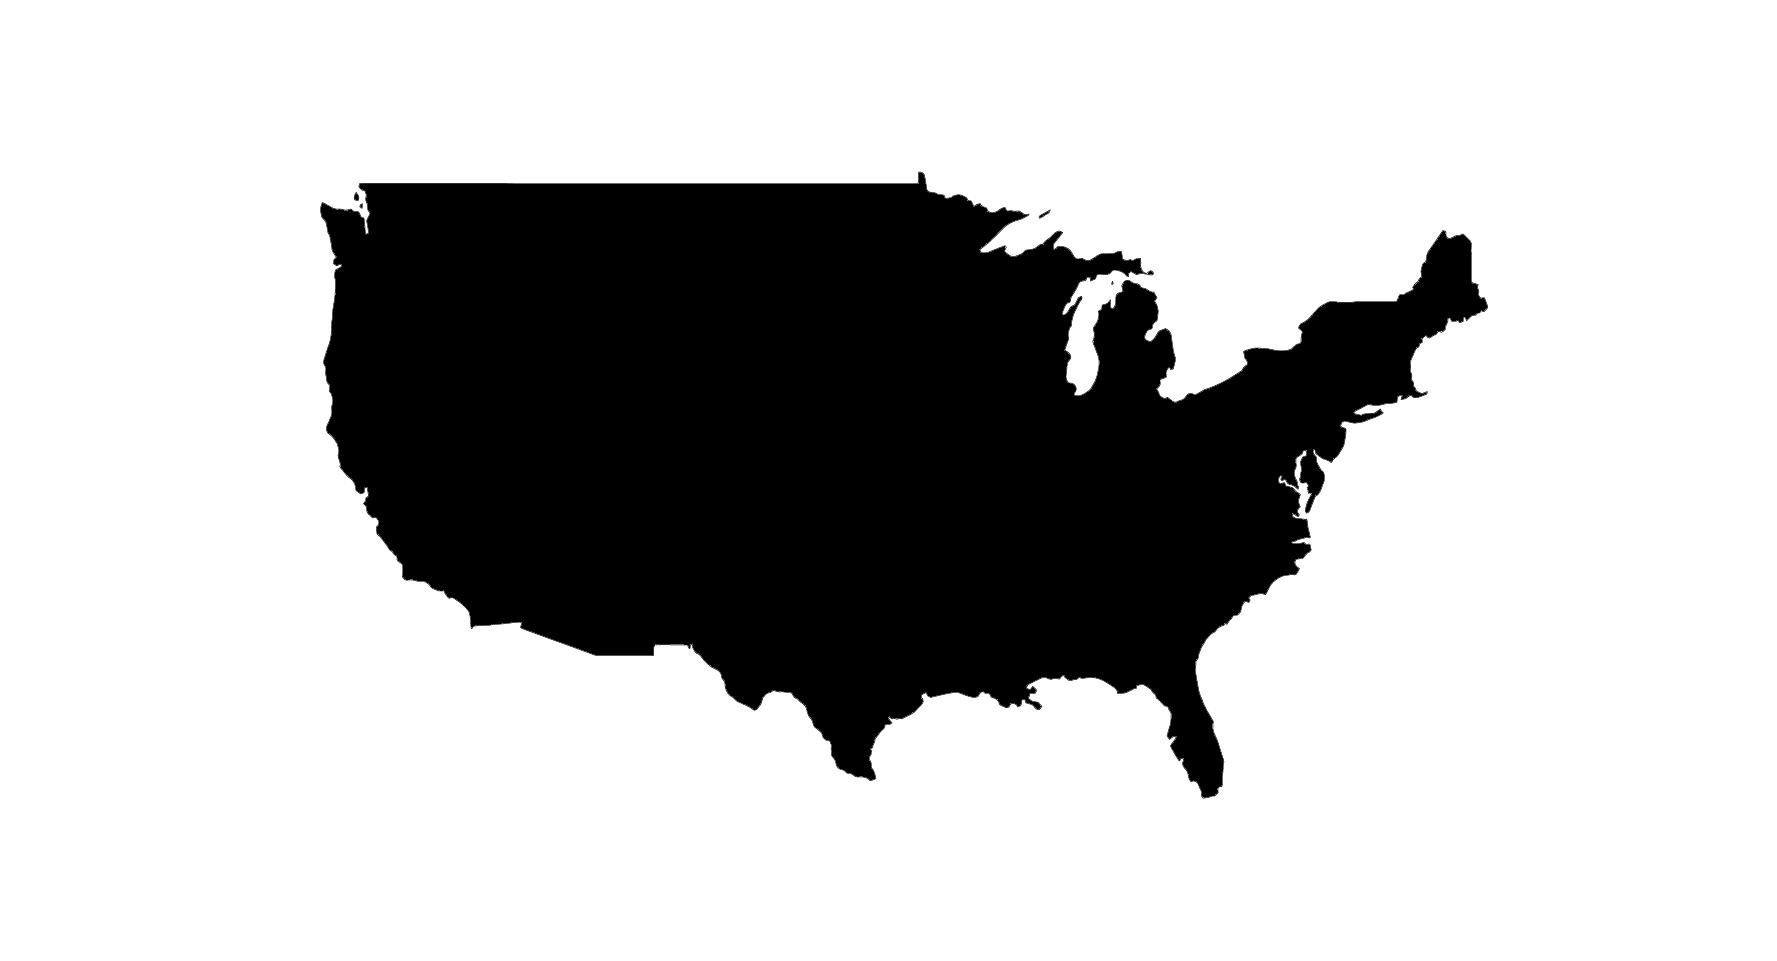 United States Boundaries